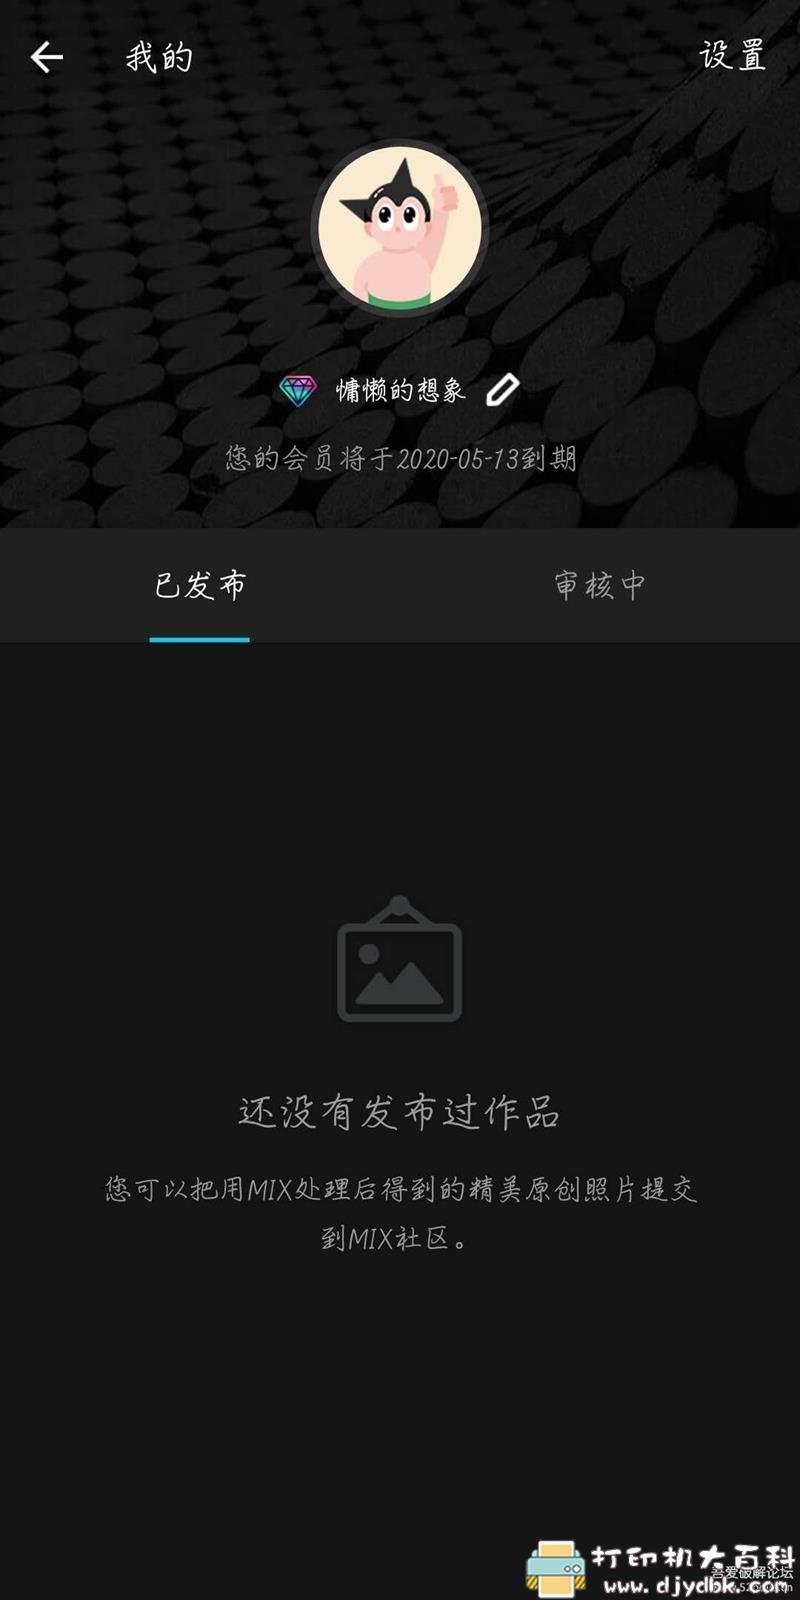 [Android]图片美化工具 MIX滤镜大师 v4.9.9 VIP版图片 No.2